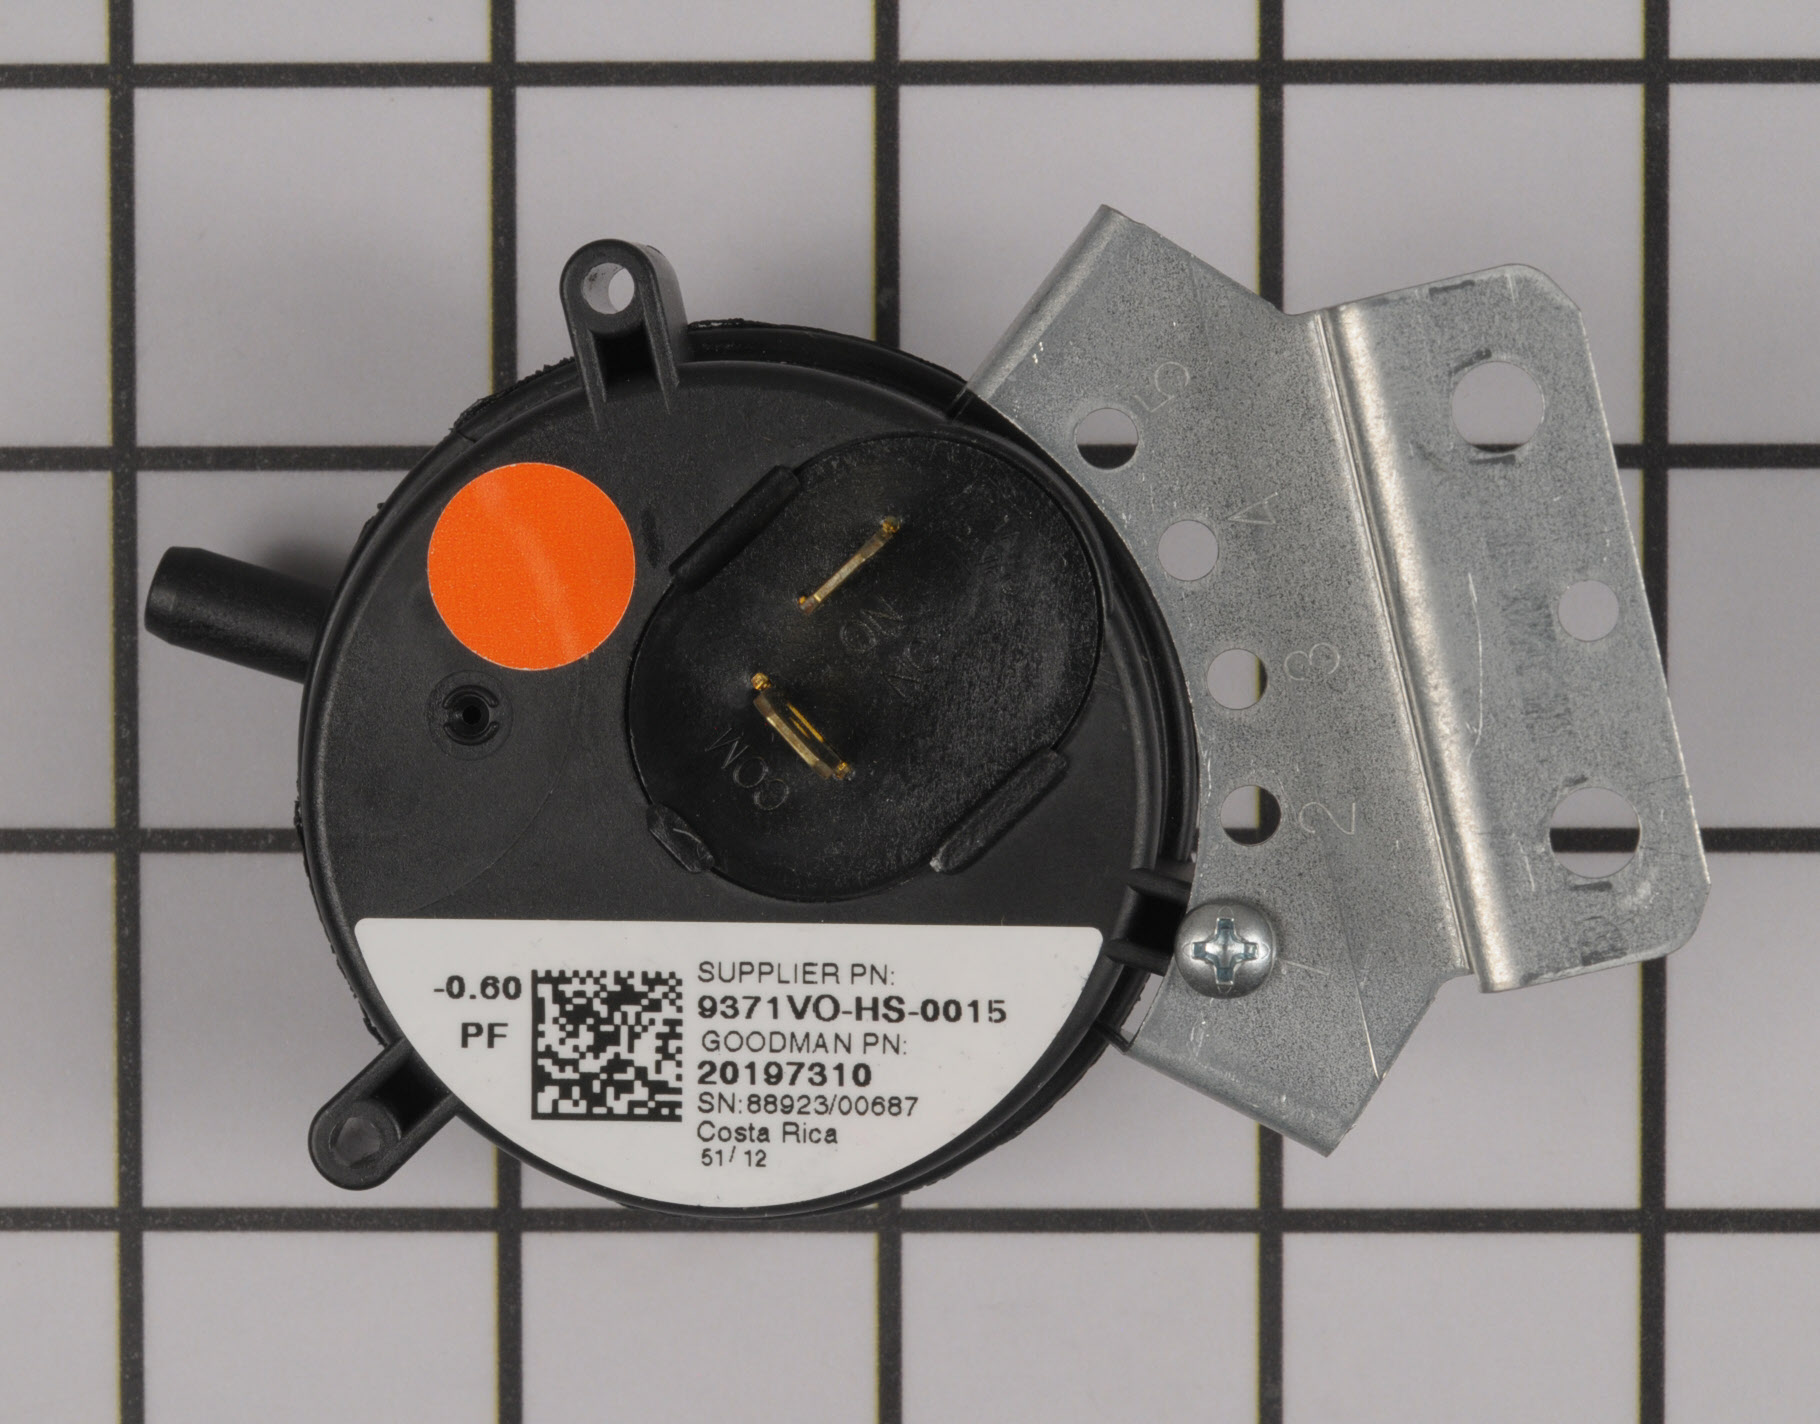 20197310 Goodman Furnace Part -Pressure Switch